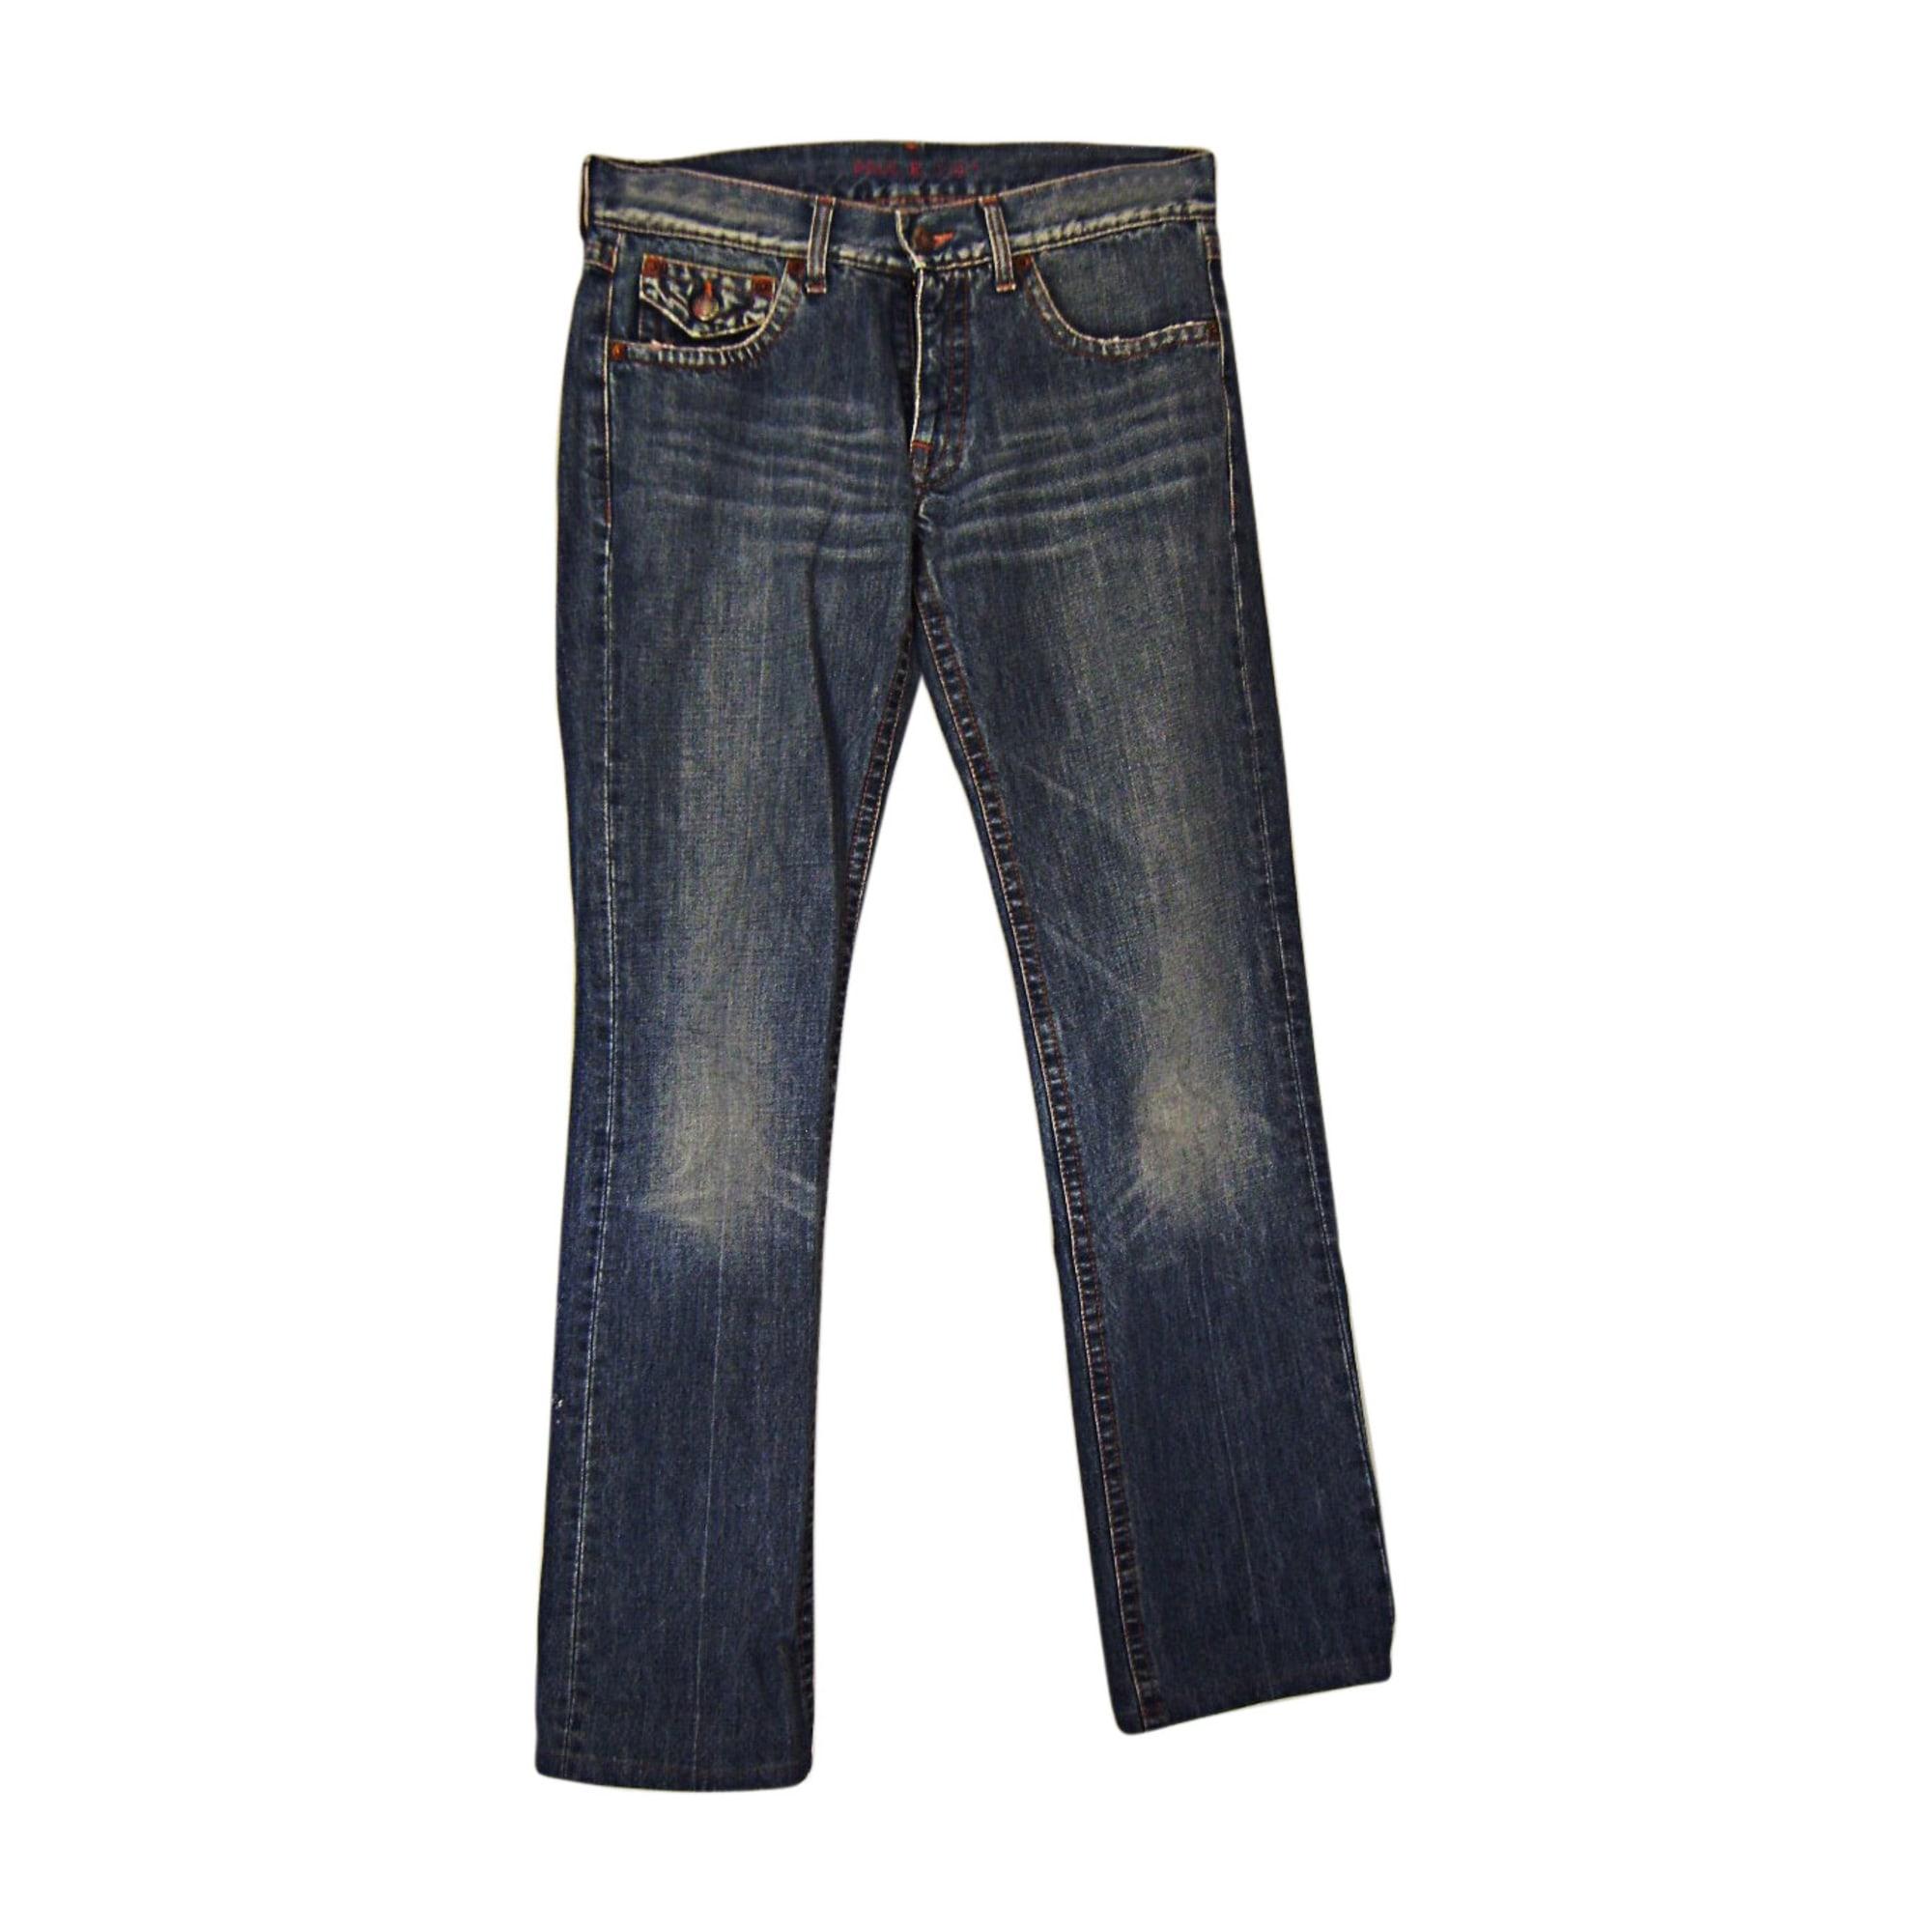 Jeans droit PAUL & JOE Bleu, bleu marine, bleu turquoise